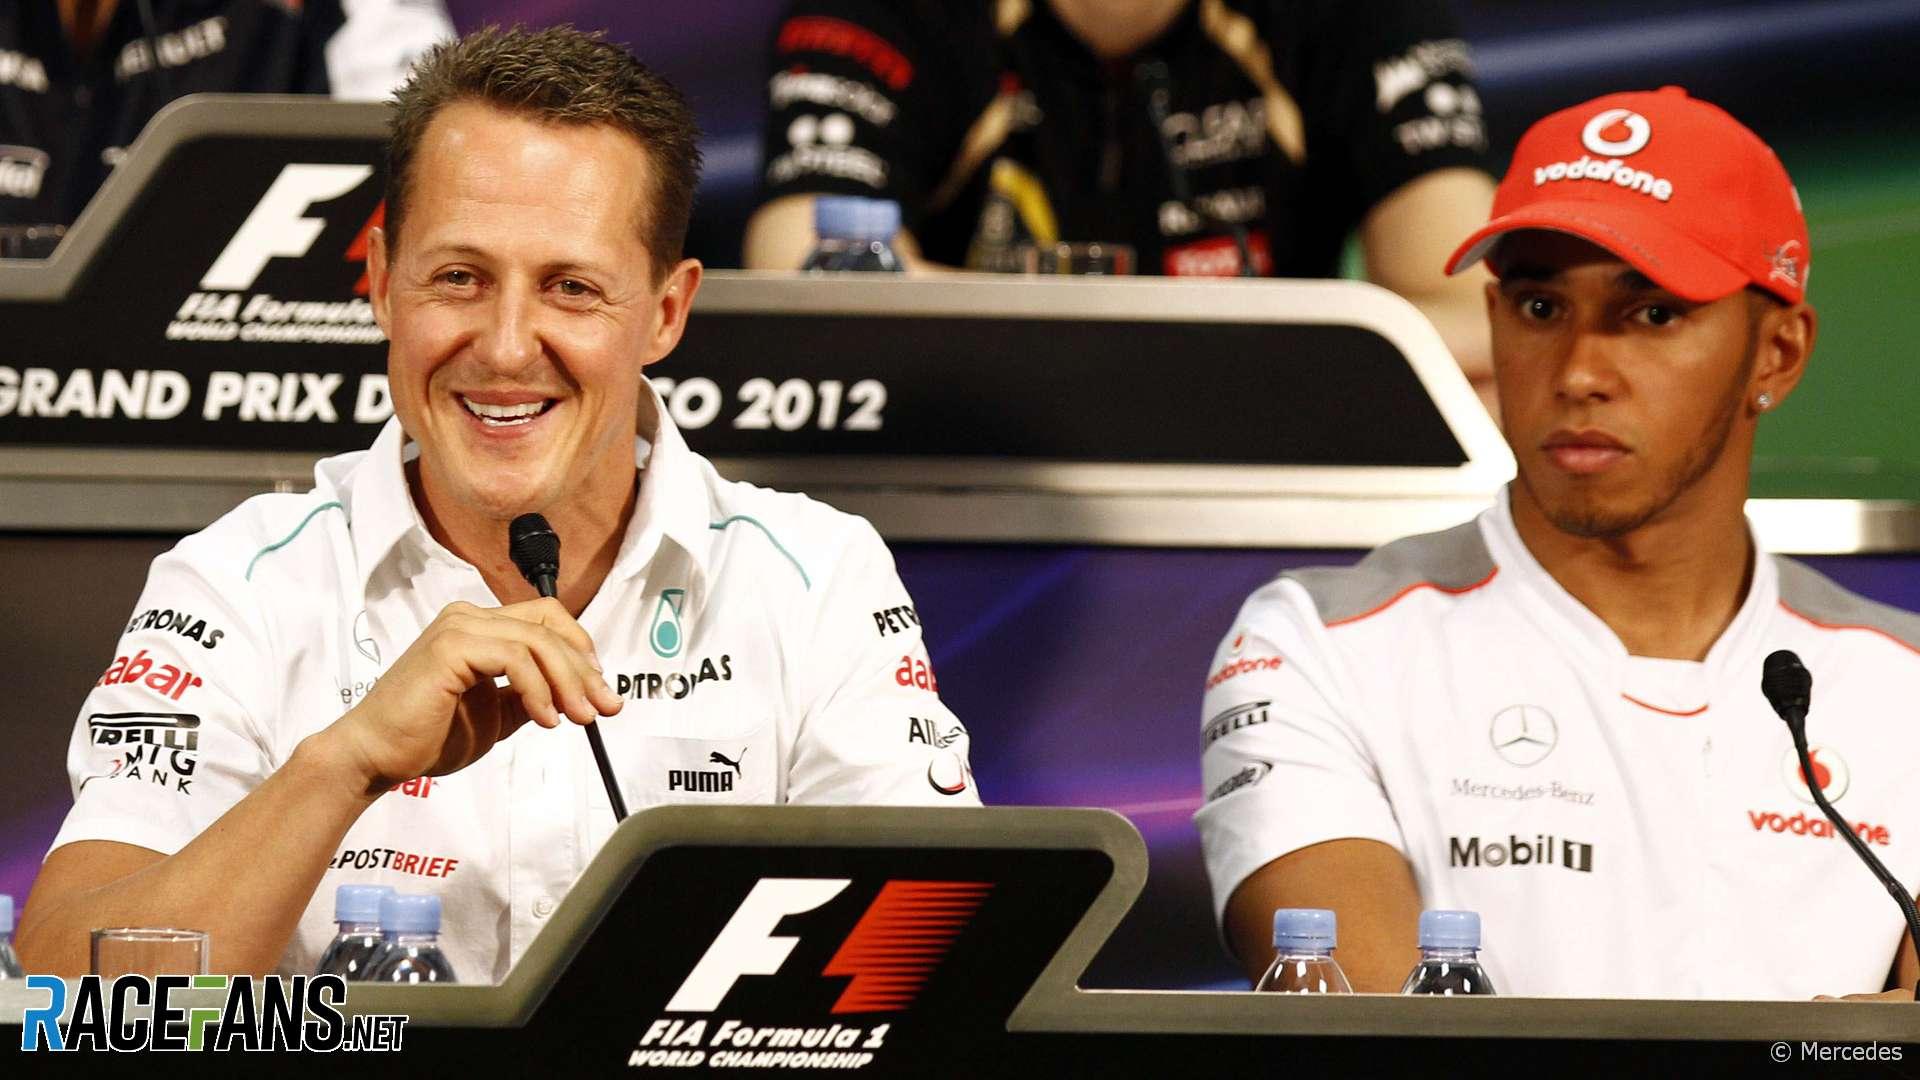 Michael Schumacher, Lewis Hamilton. Monaco, 2012